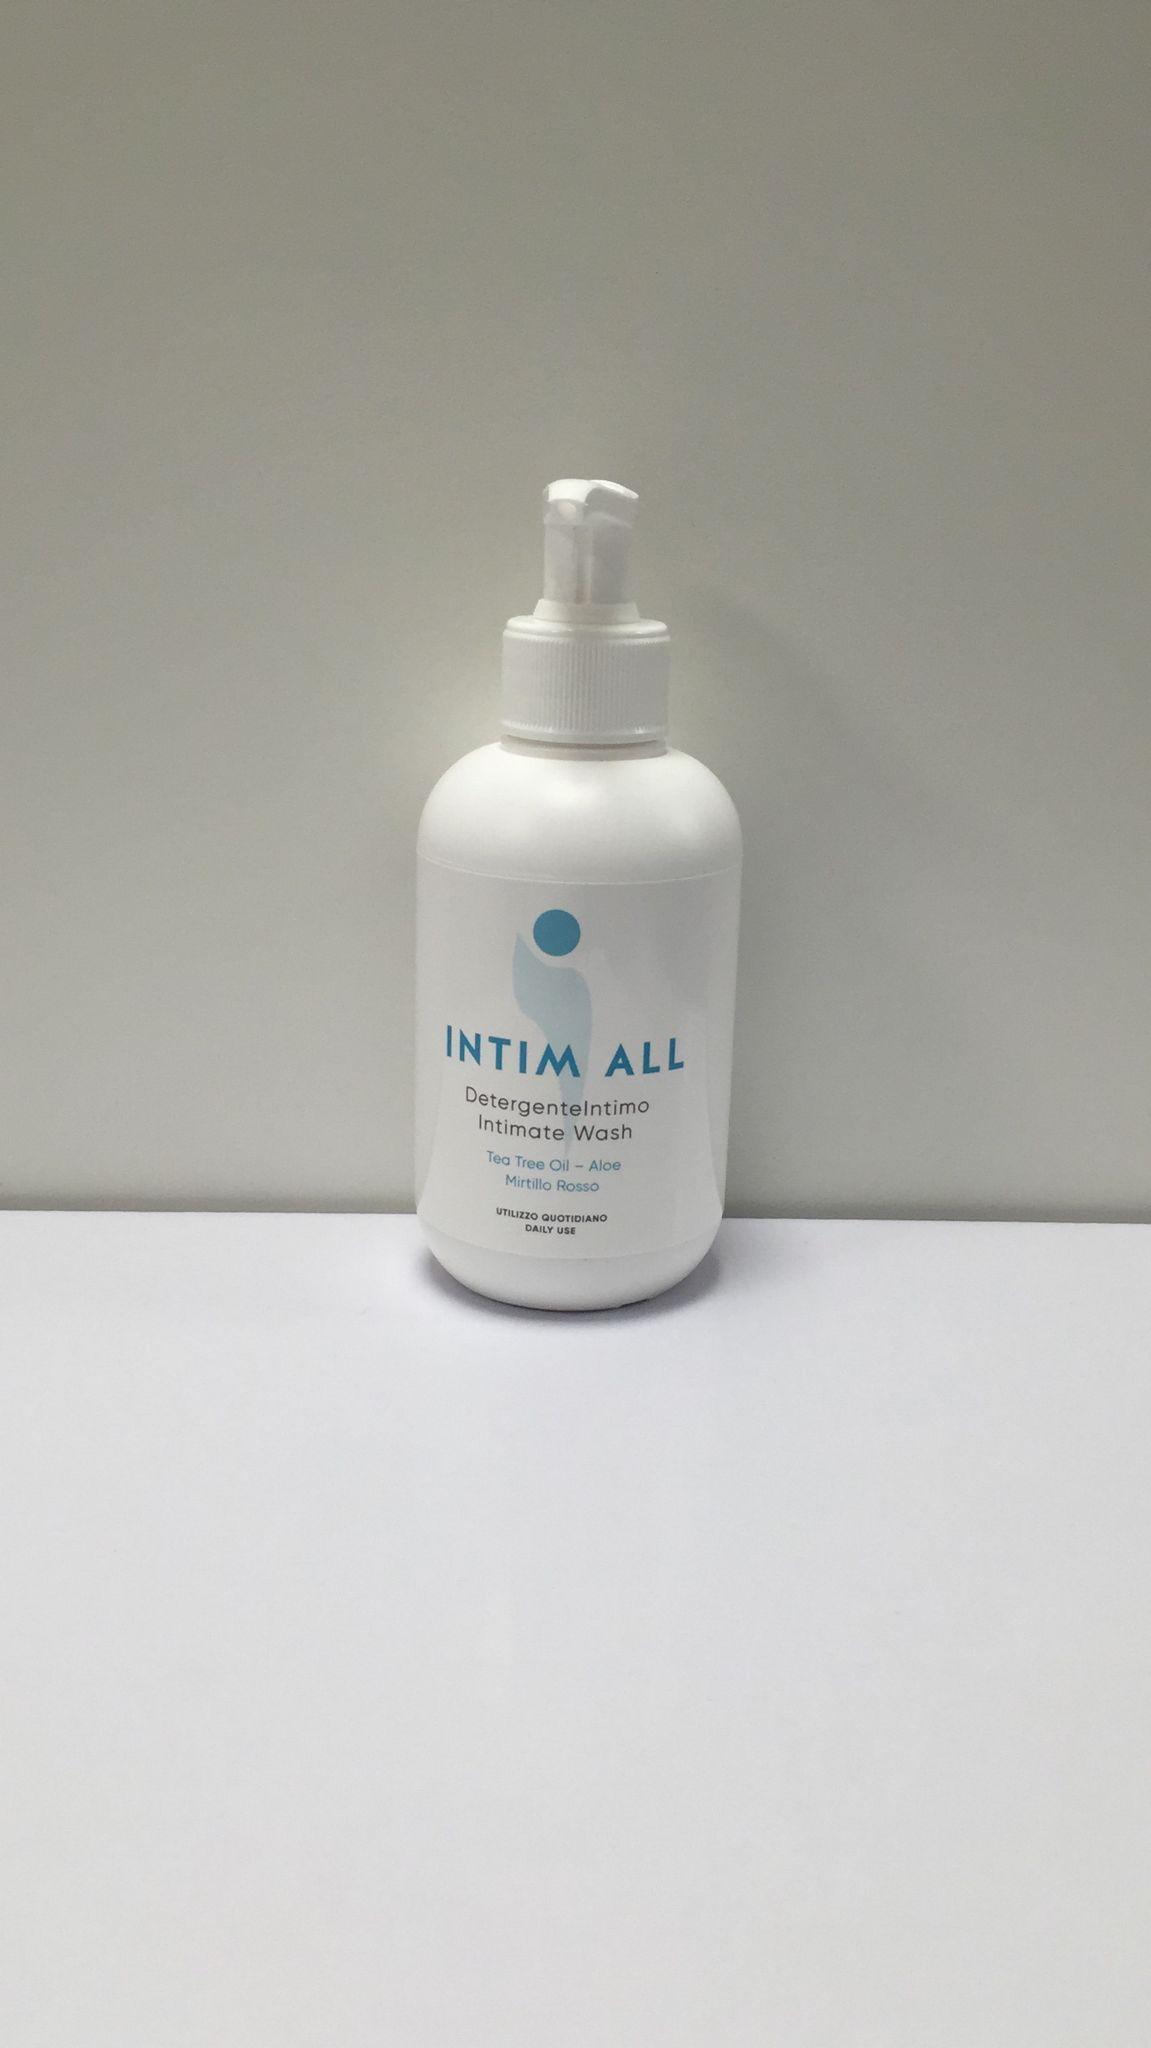 Intim All Detergente Intimo 250ml - Arcafarma.it